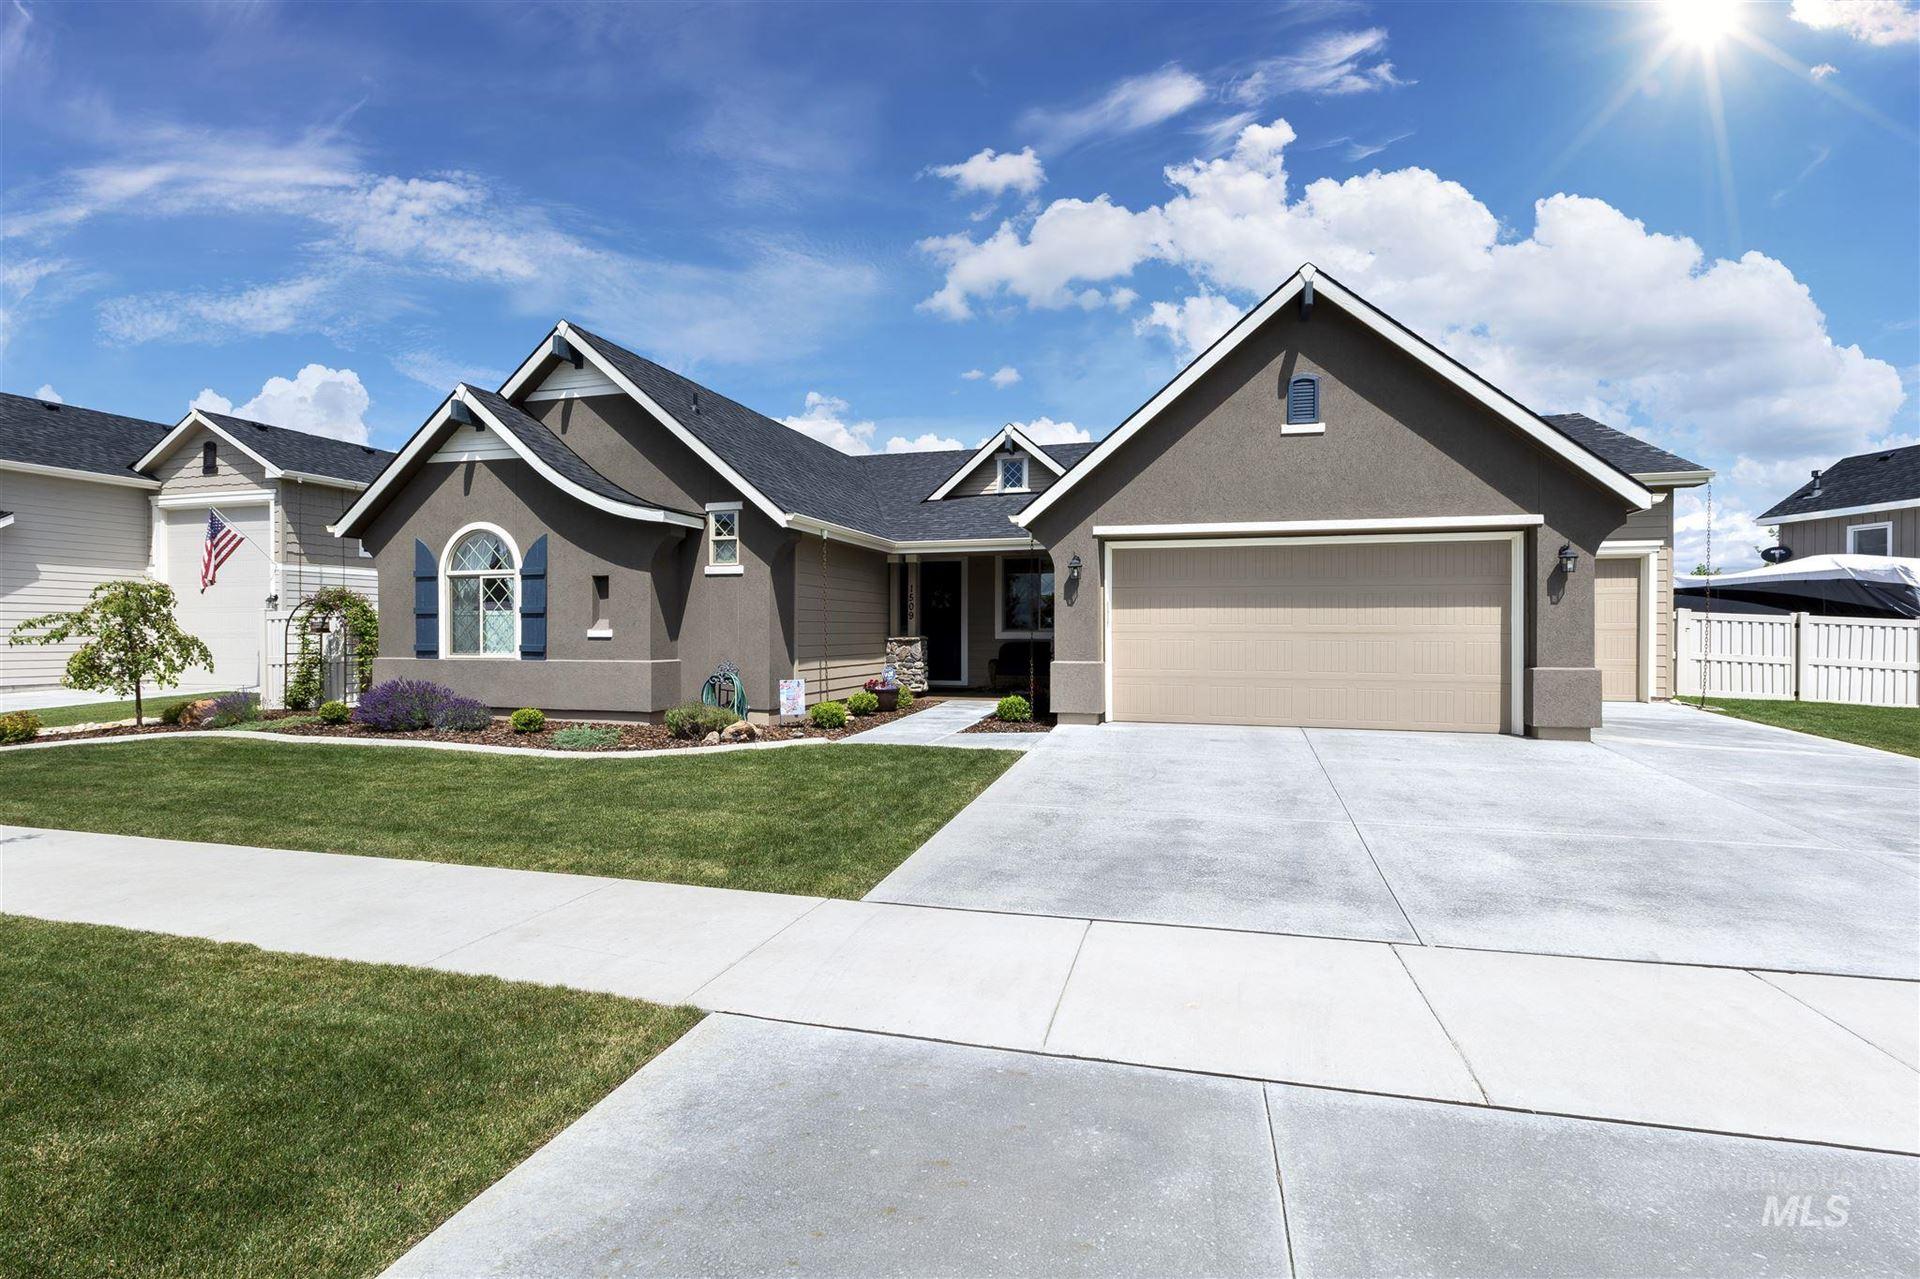 1509 Big Horn  Ct., Middleton, ID 83644 - MLS#: 98772383